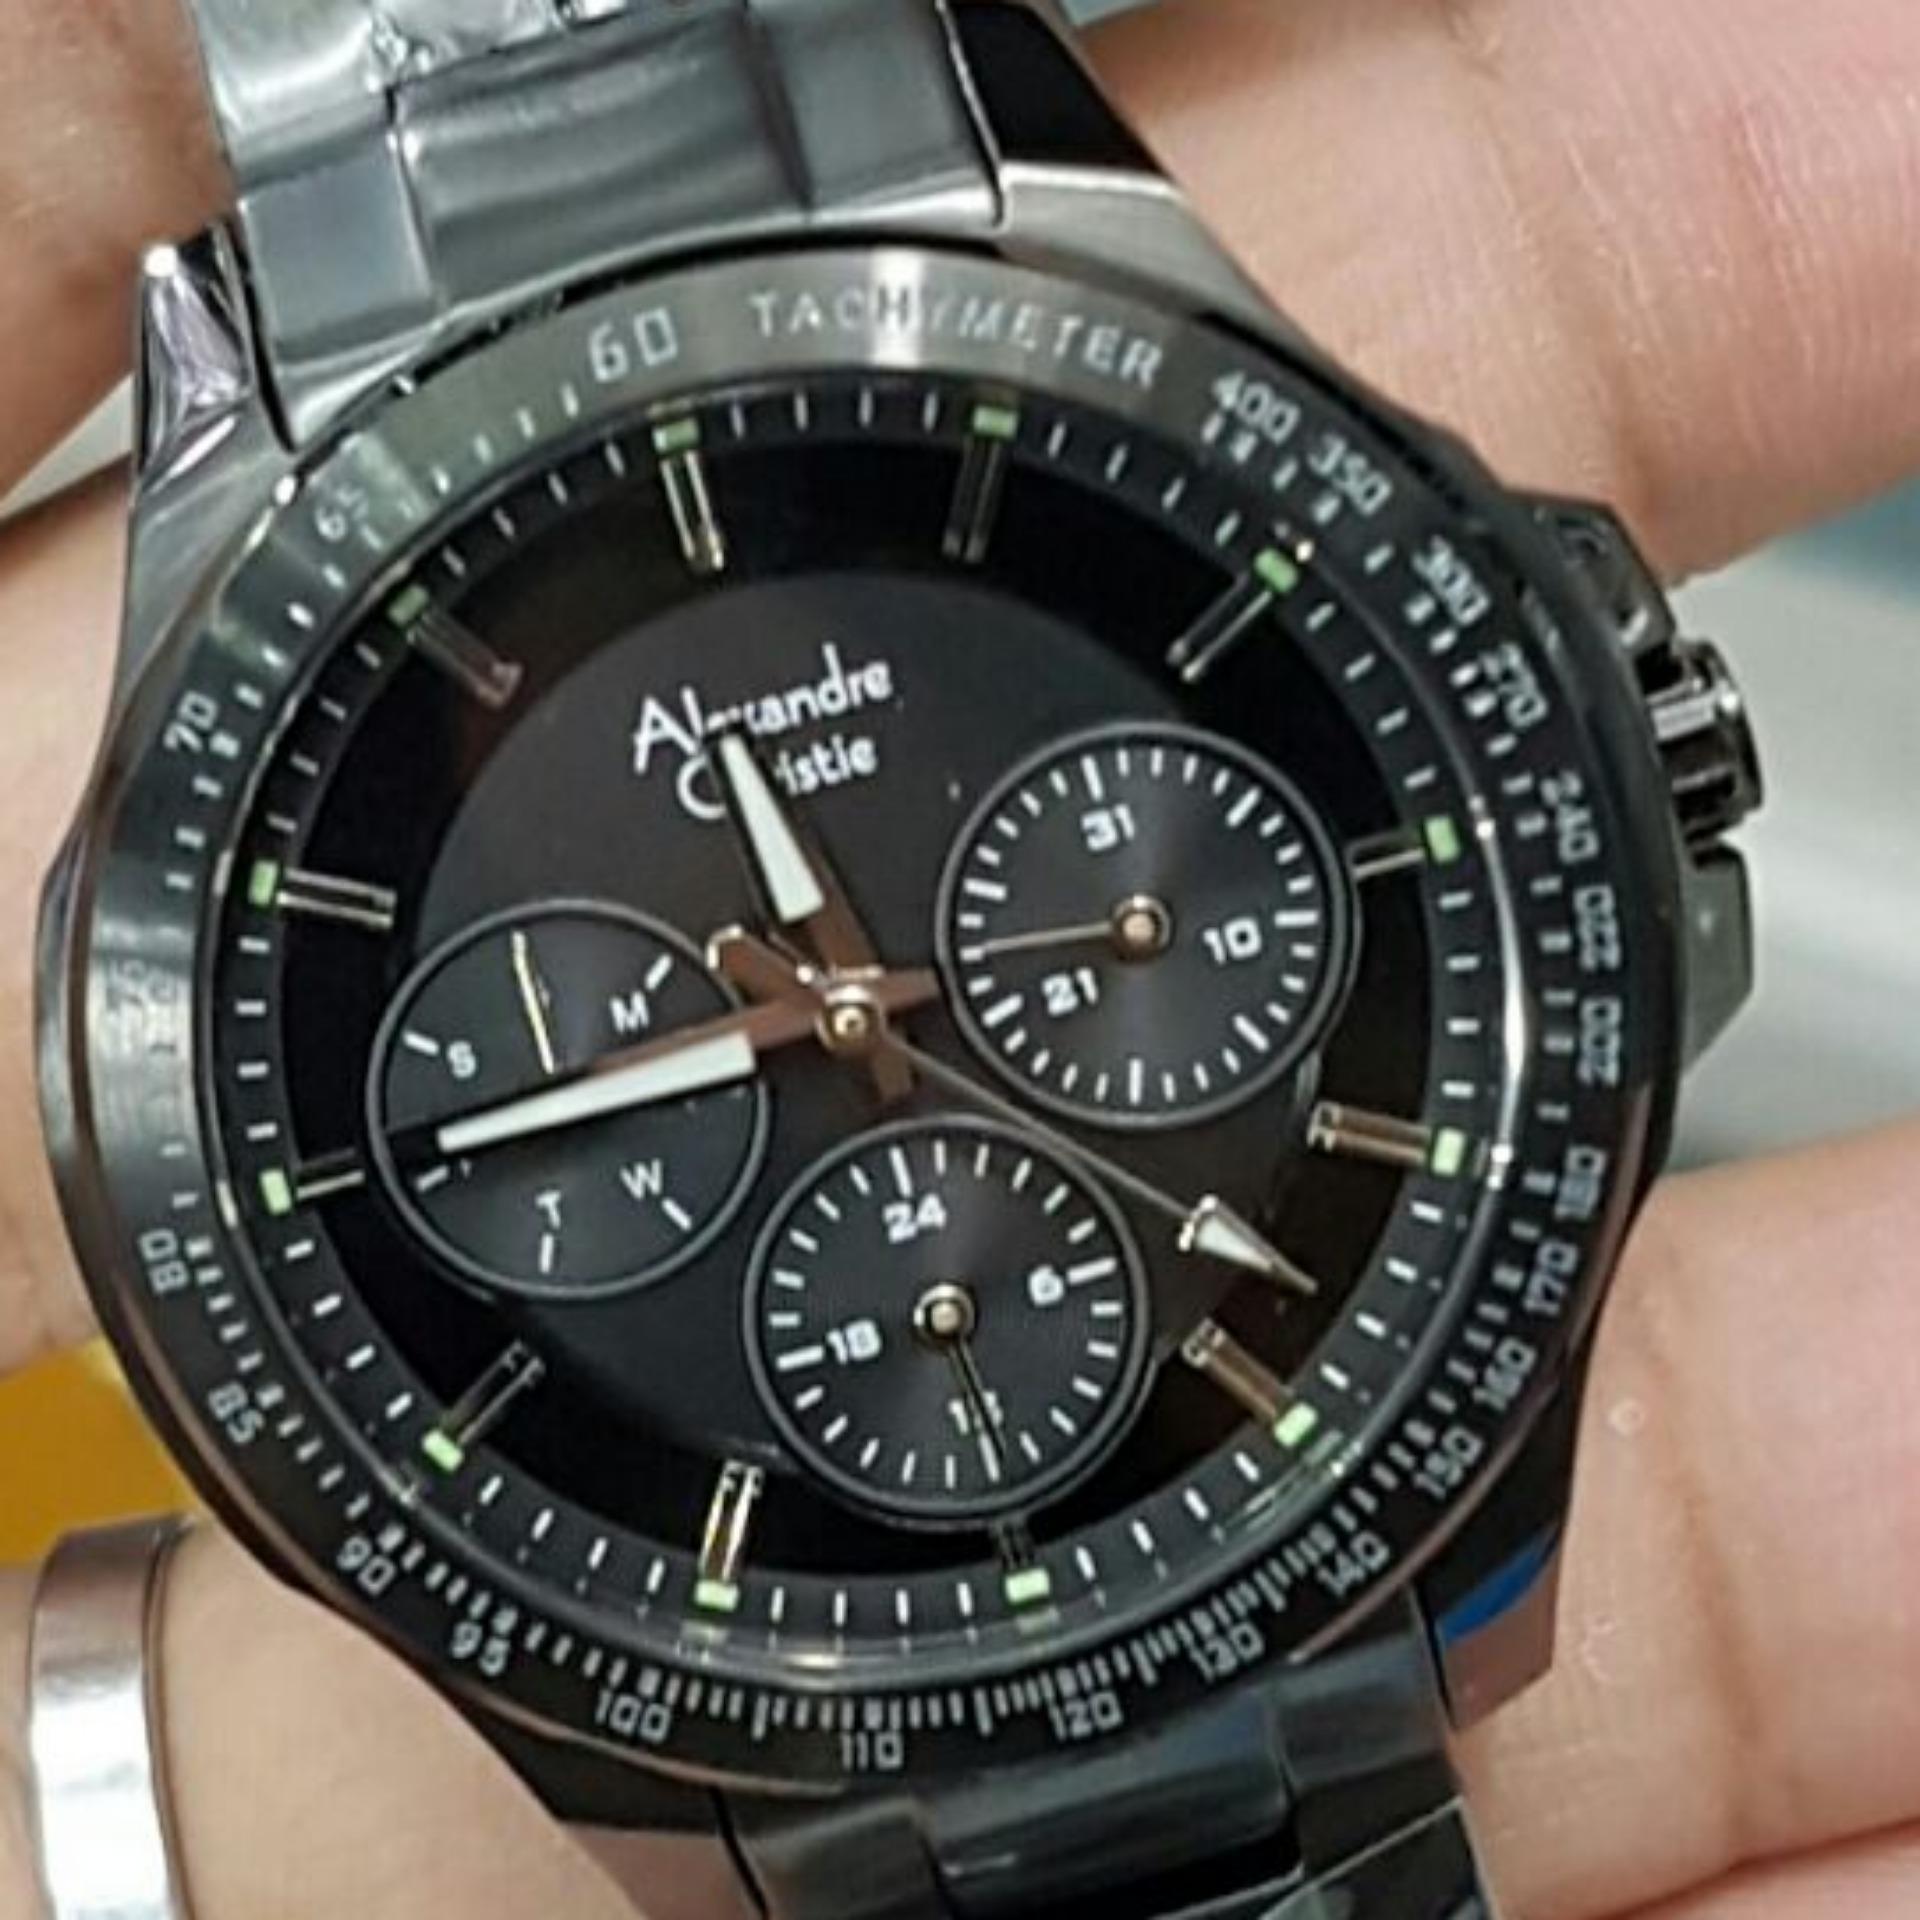 Alexandre Christie Collection 6195mcltbba Jam Tangan Pria5 Daftar 1430690 Chronograph Tali Rantai Pria Silver Ac6352 Wanita Stainless Steel